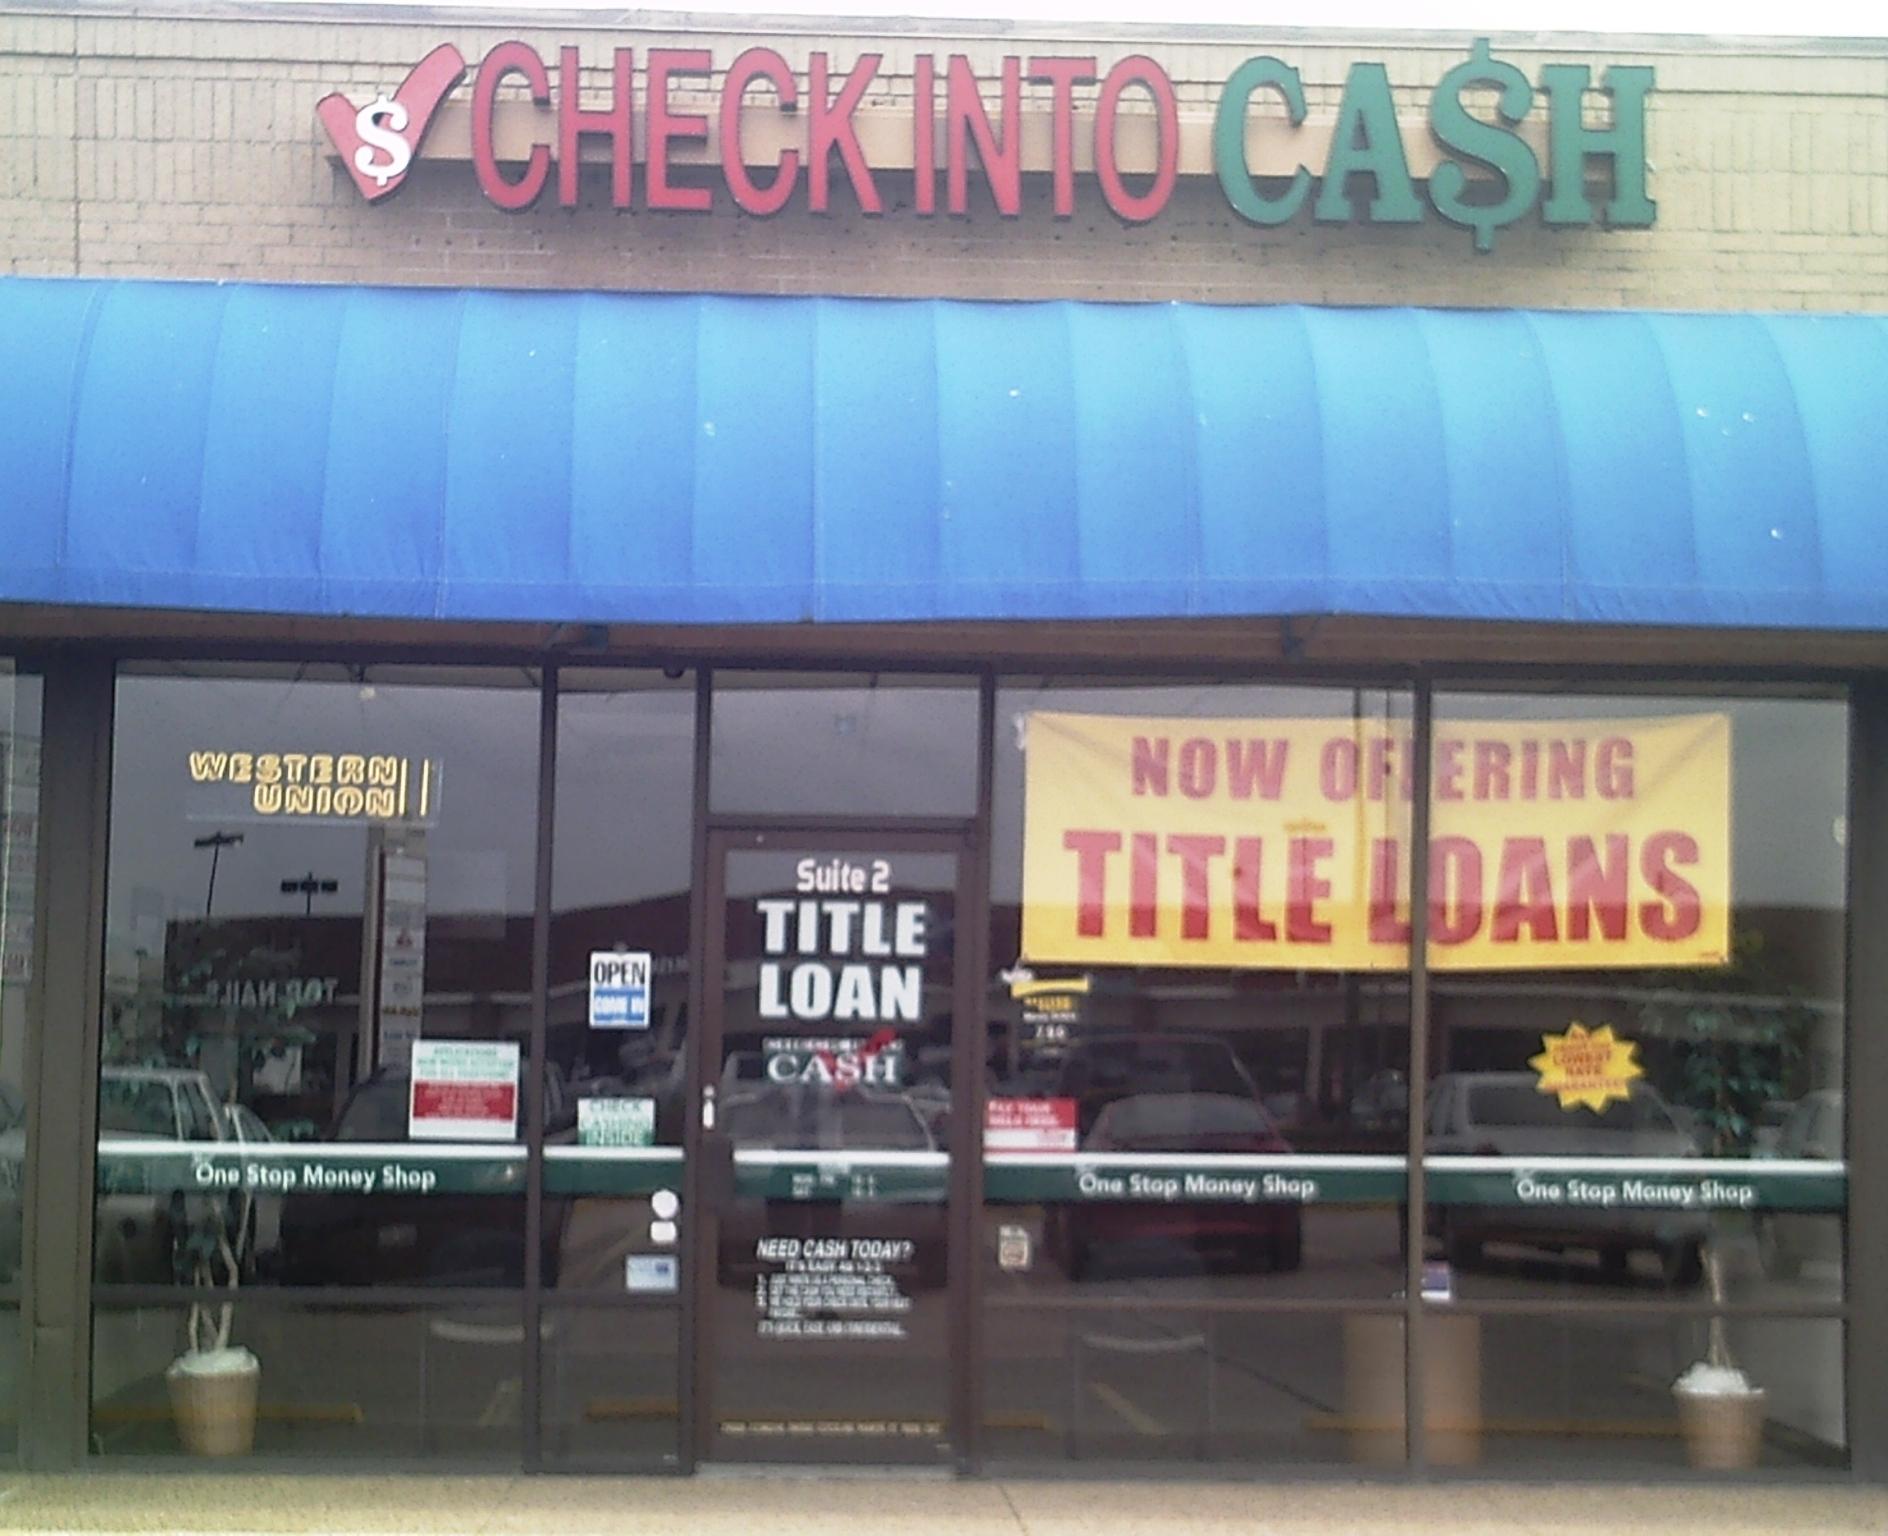 Cash money loans brampton image 5